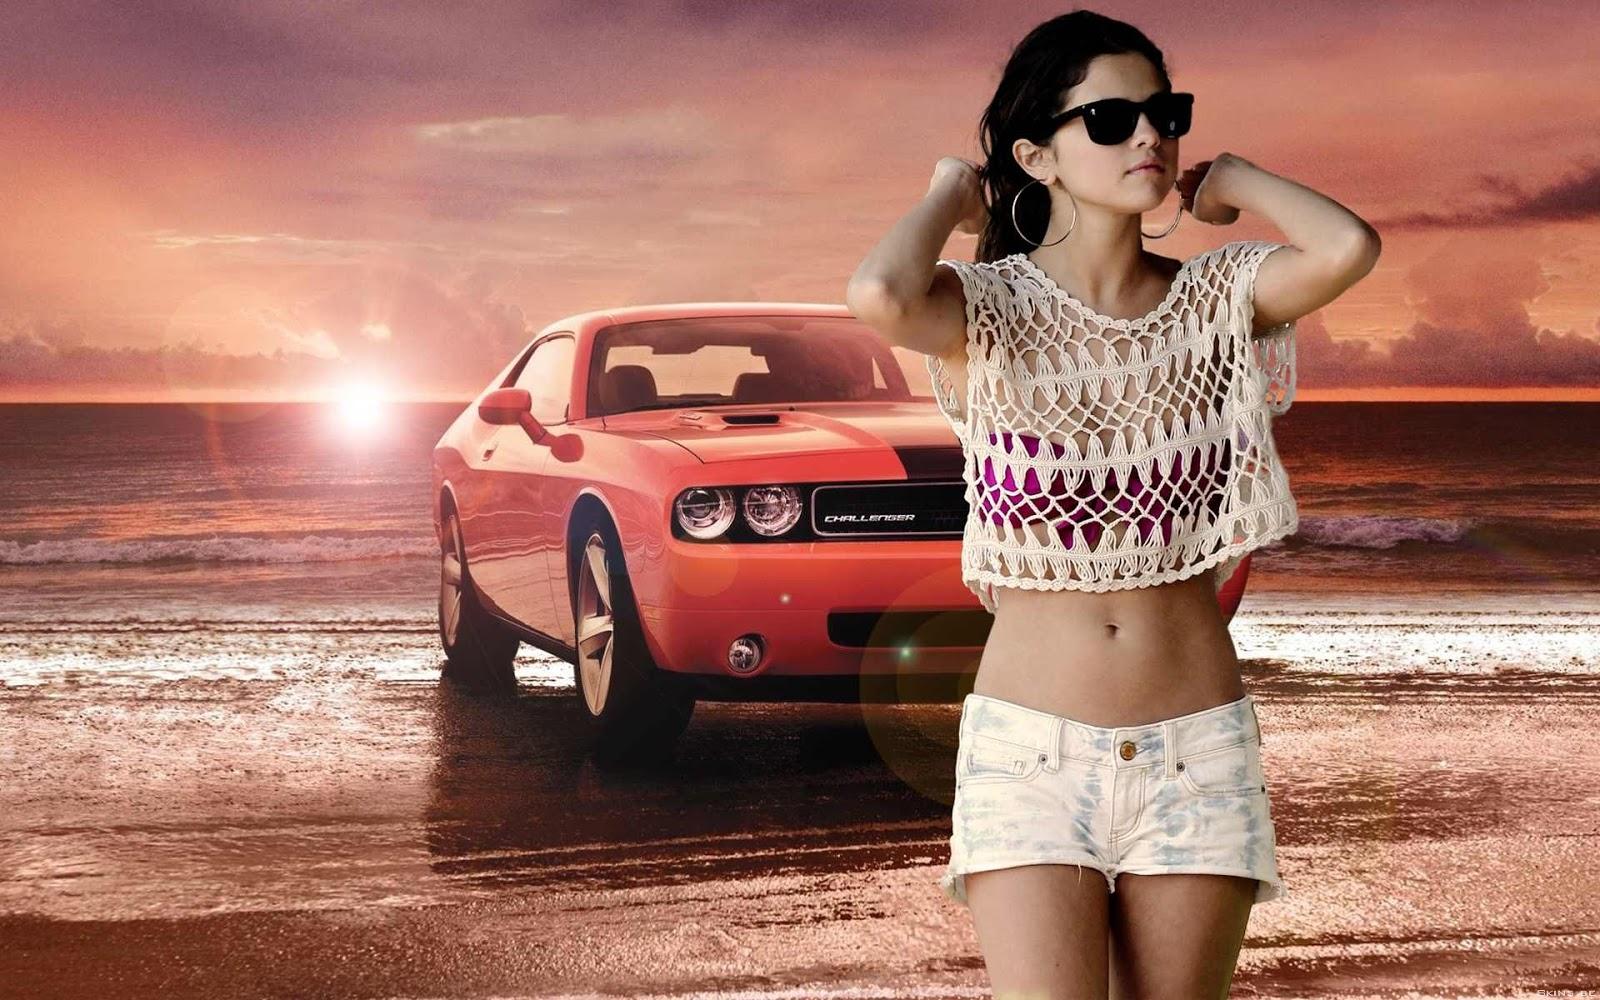 Hd wallpapers - Selena gomez latest hd wallpapers ...